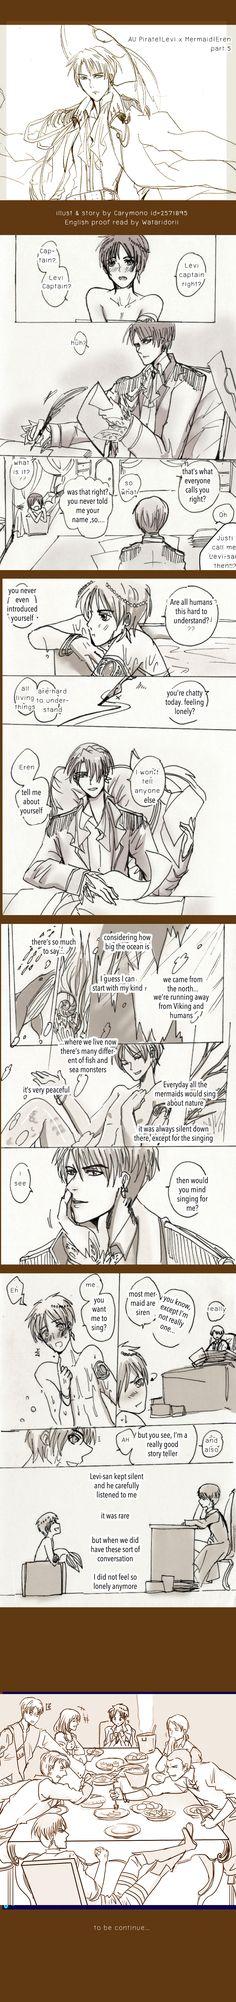 SnK'AU : Pirate!Levi x Mermaid!Eren part5 by illuscarymono.deviantart.com on @deviantART